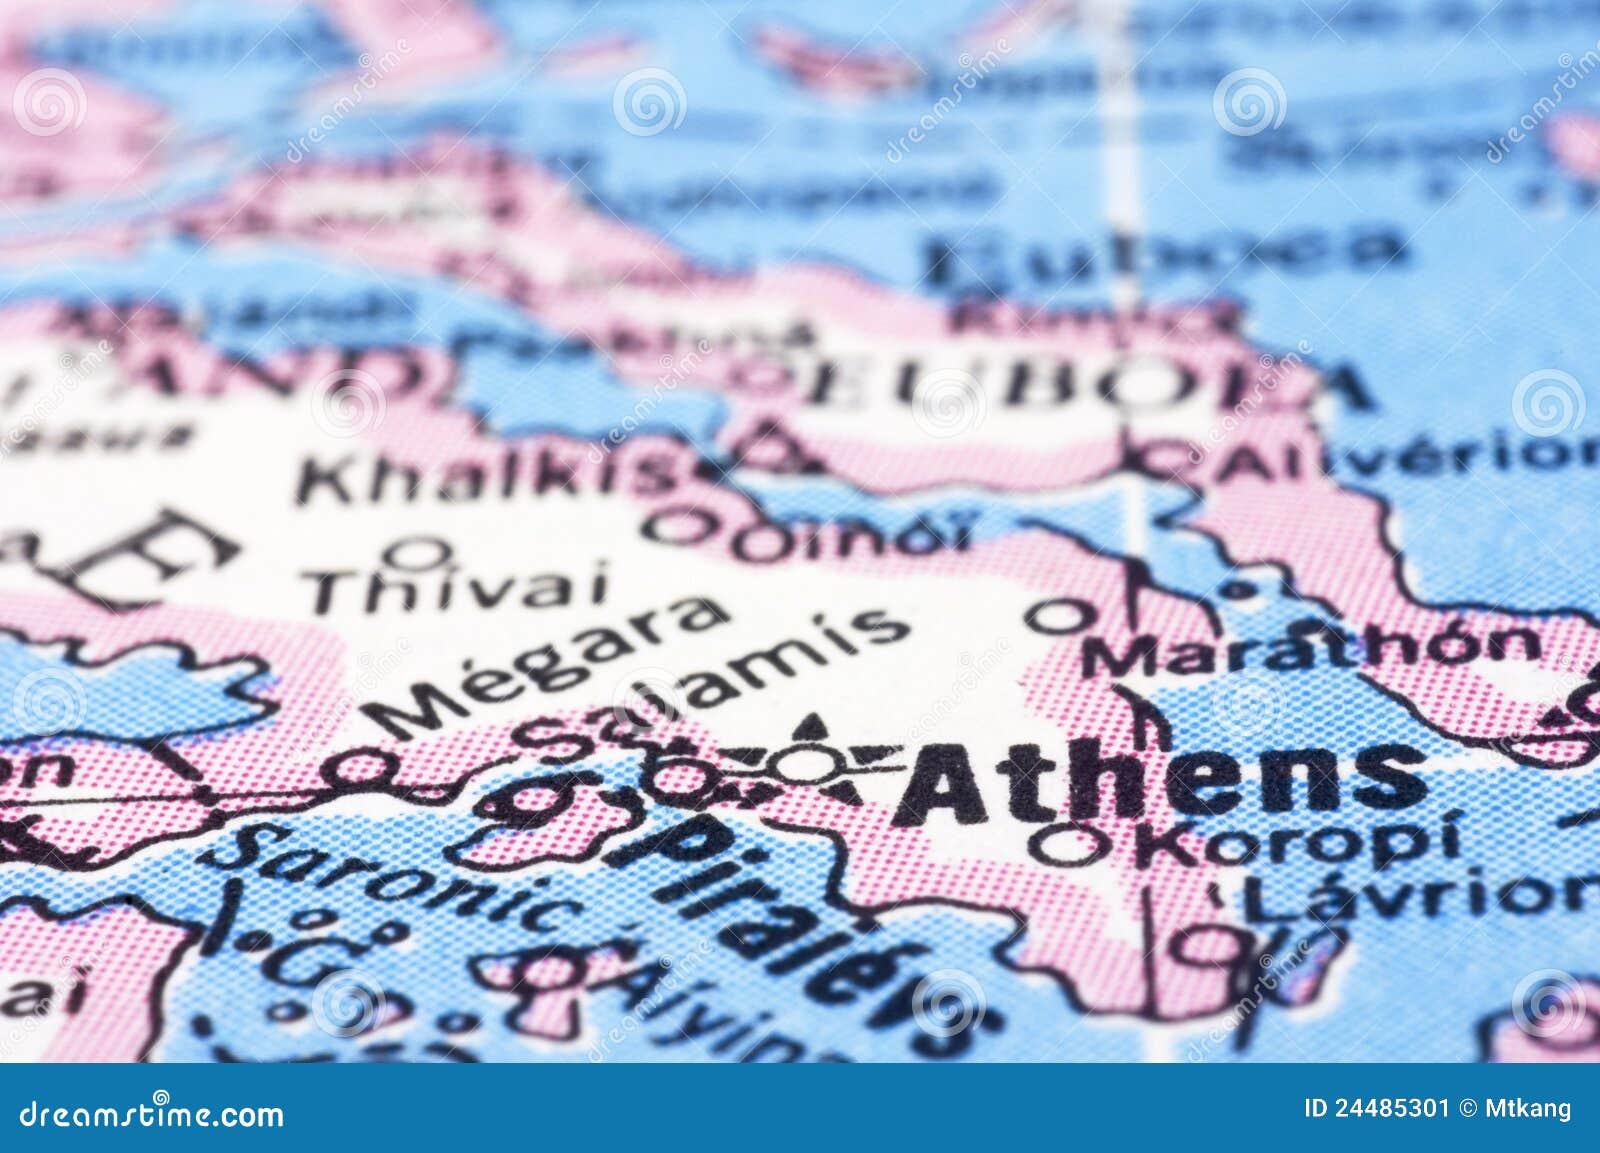 Athens Utilities